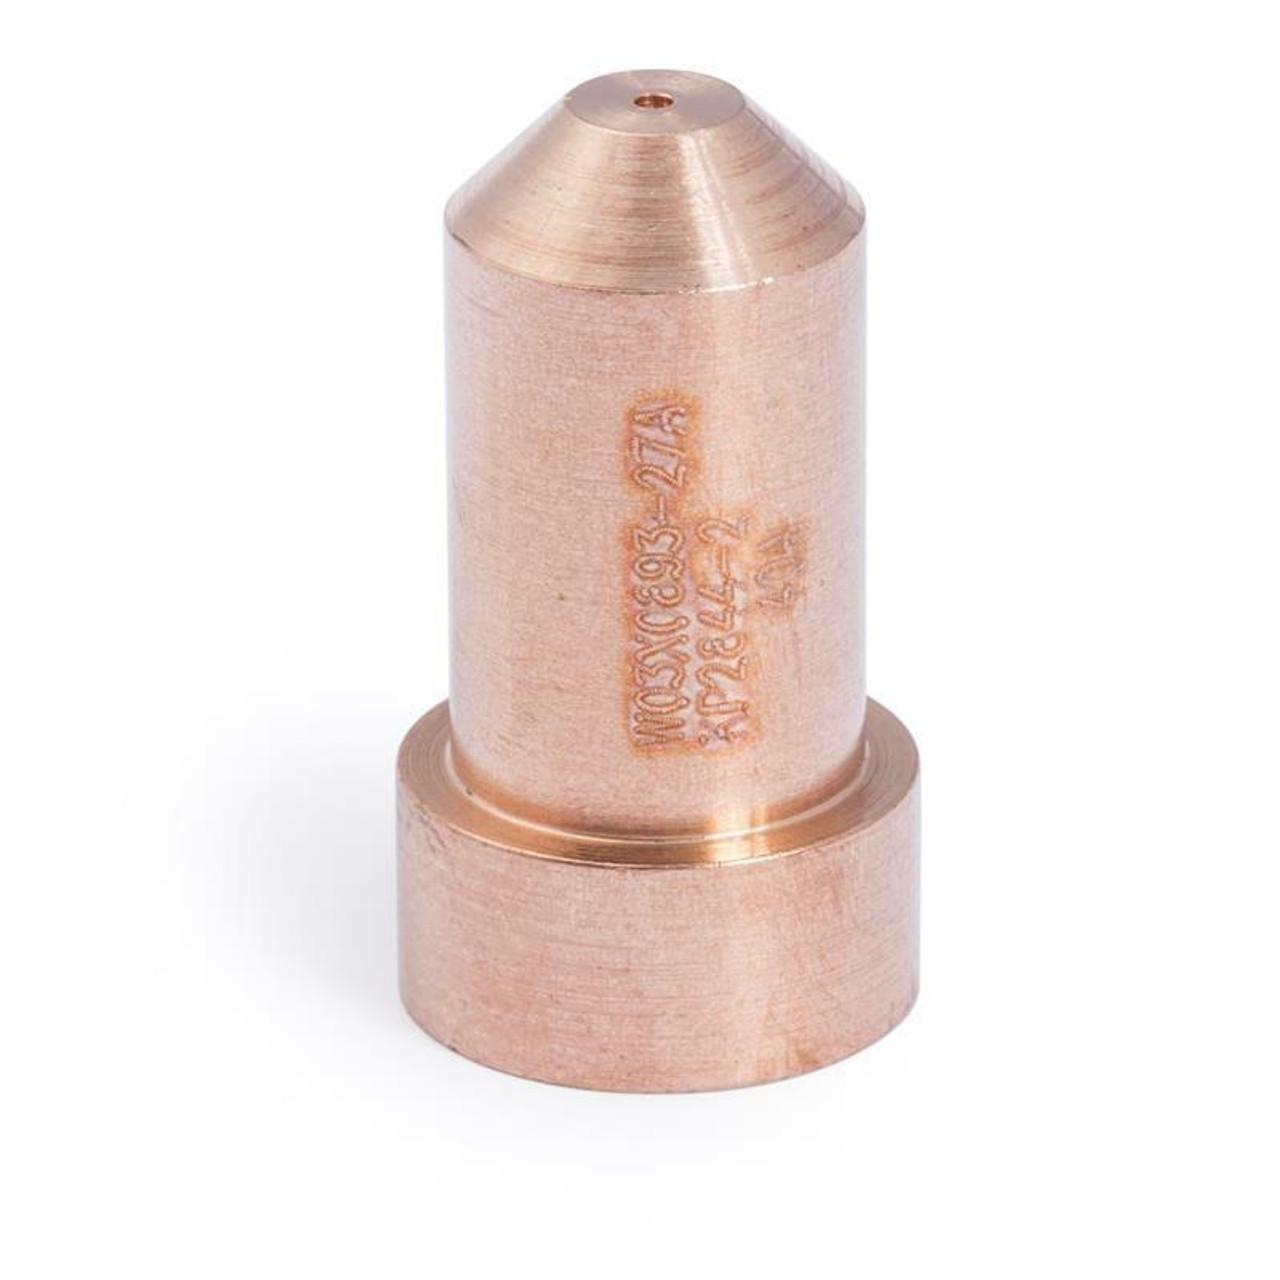 Lincoln Tomahawk 1000 Plasma 40 Amp Nozzles 5 Pack KP2844-2